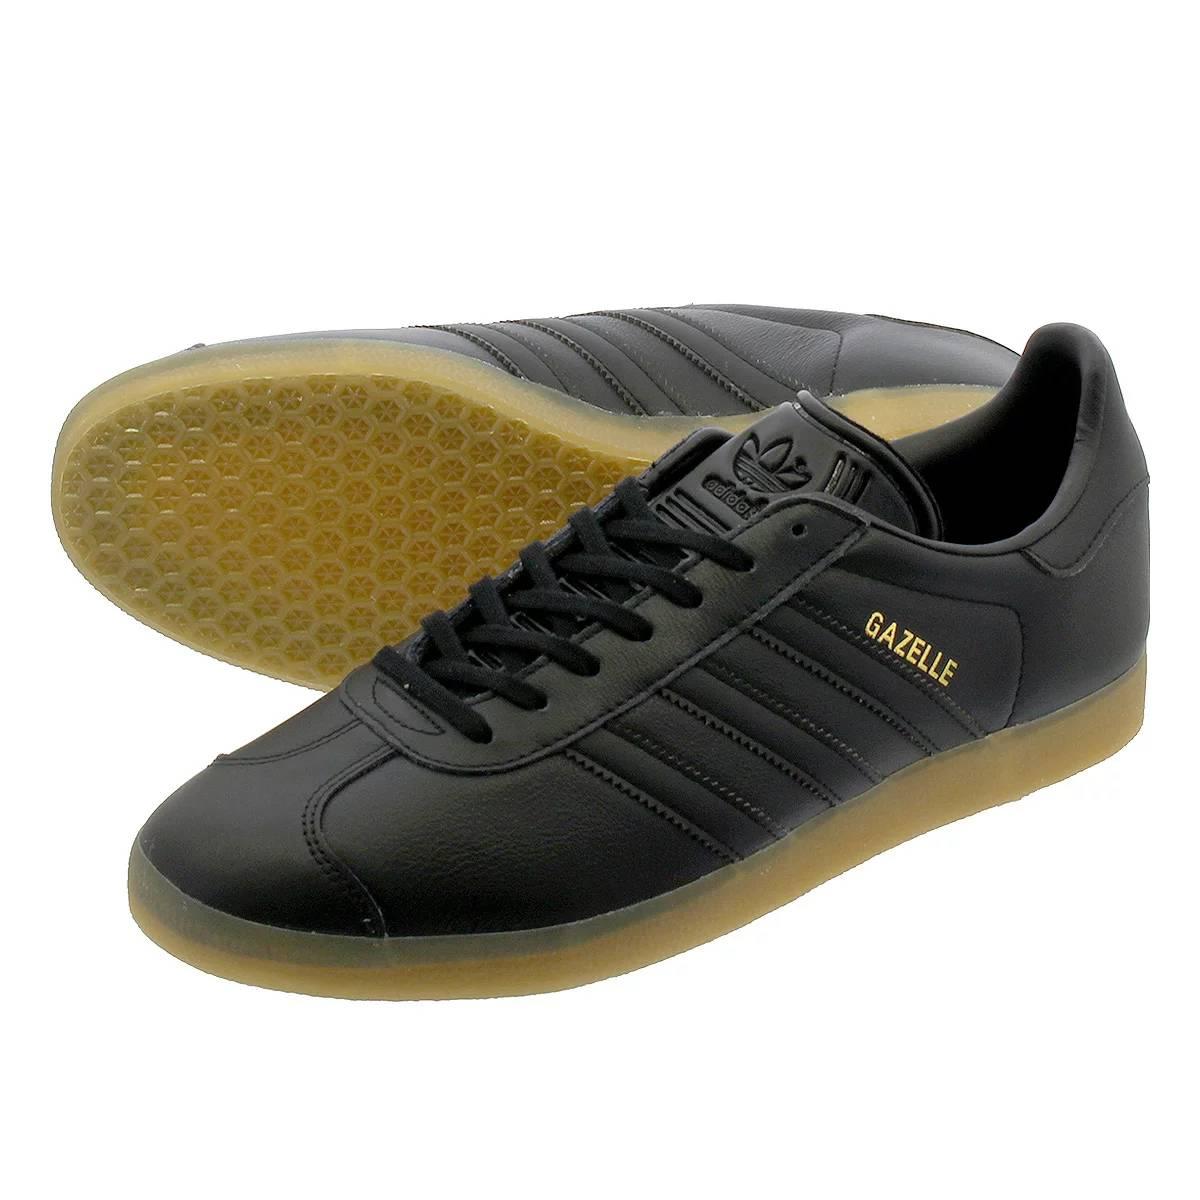 adidas GAZELLE 【adidas Originals】 アディダス ガッツレー ガゼル CORE BLACK/CORE BLACK/GUM bd7480